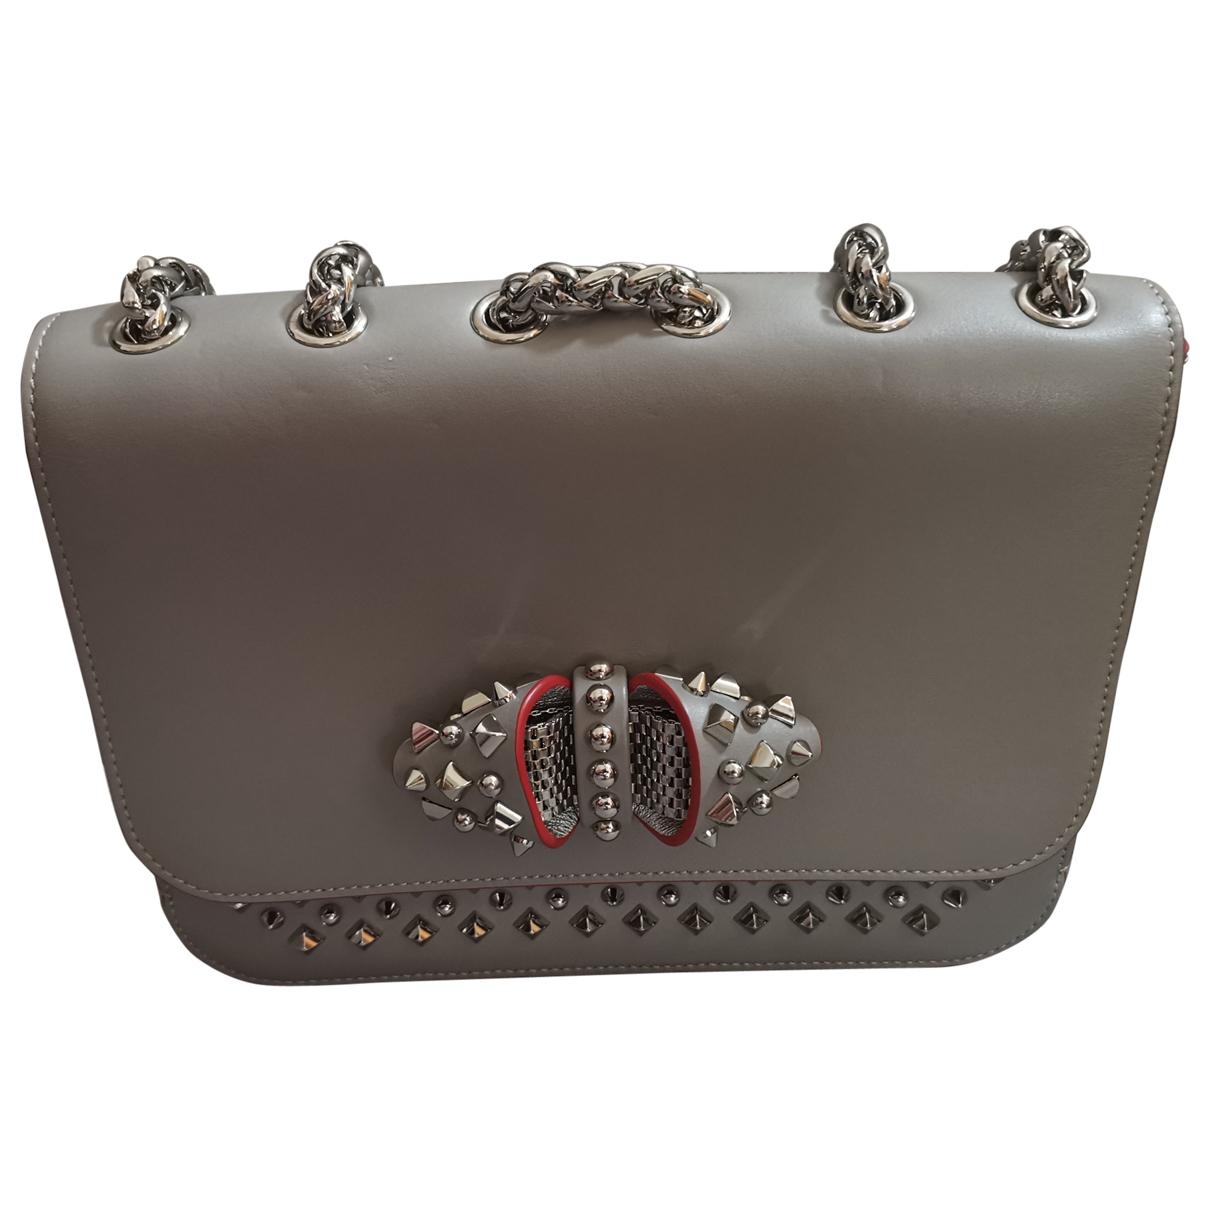 Christian Louboutin Sweet Charity Handtasche in  Grau Leder